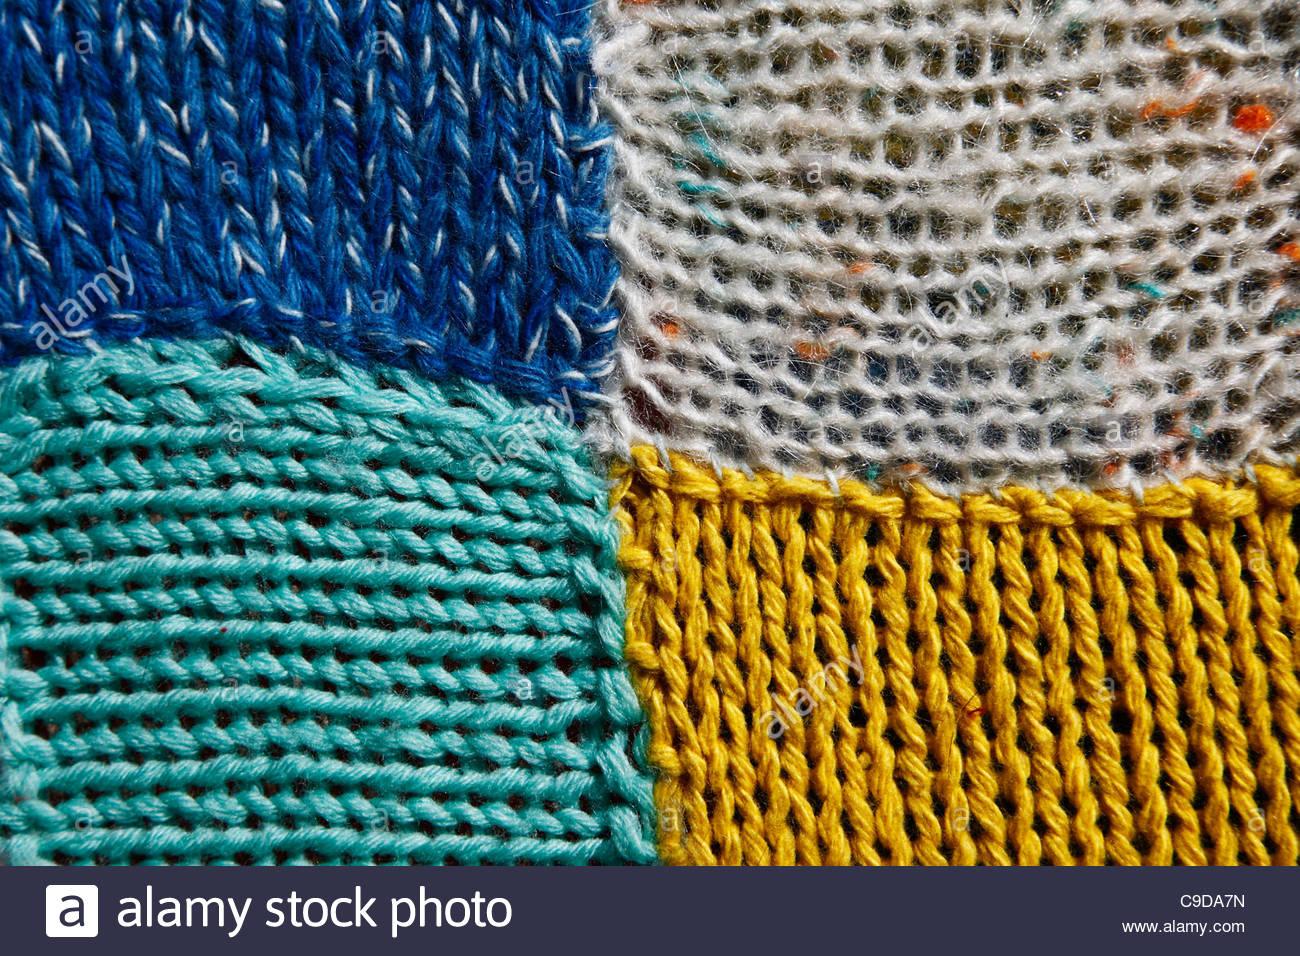 wool blanket, details - Stock Image